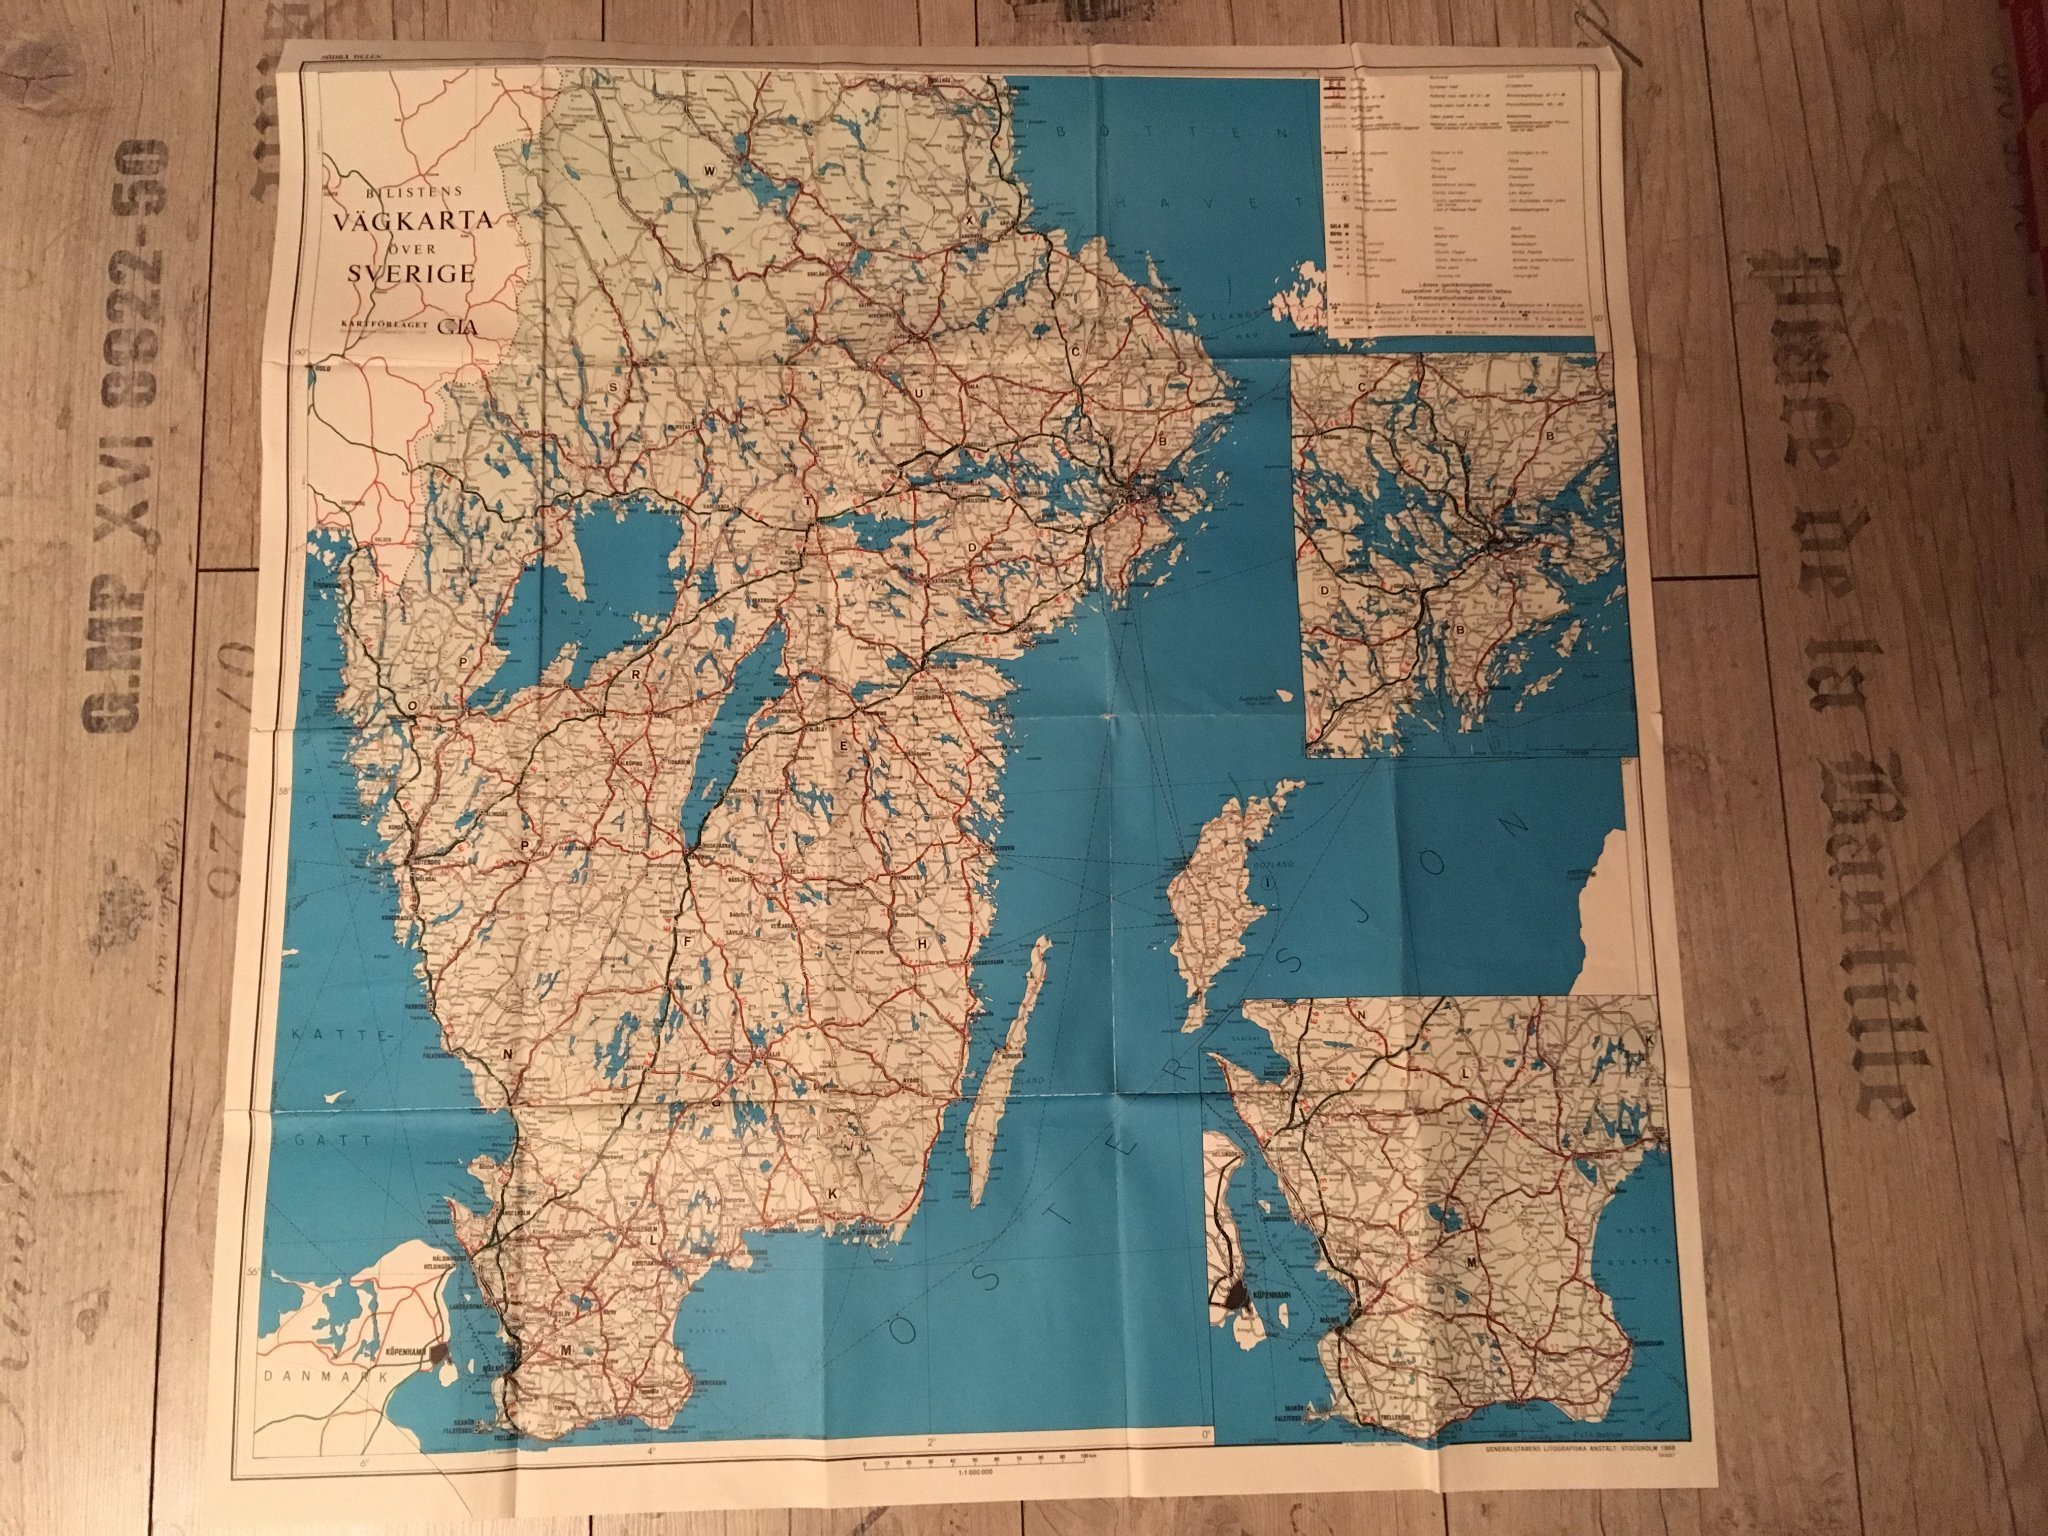 Karta Bilistens Vagkarta Over Sverige Sodra D 375753384 ᐈ